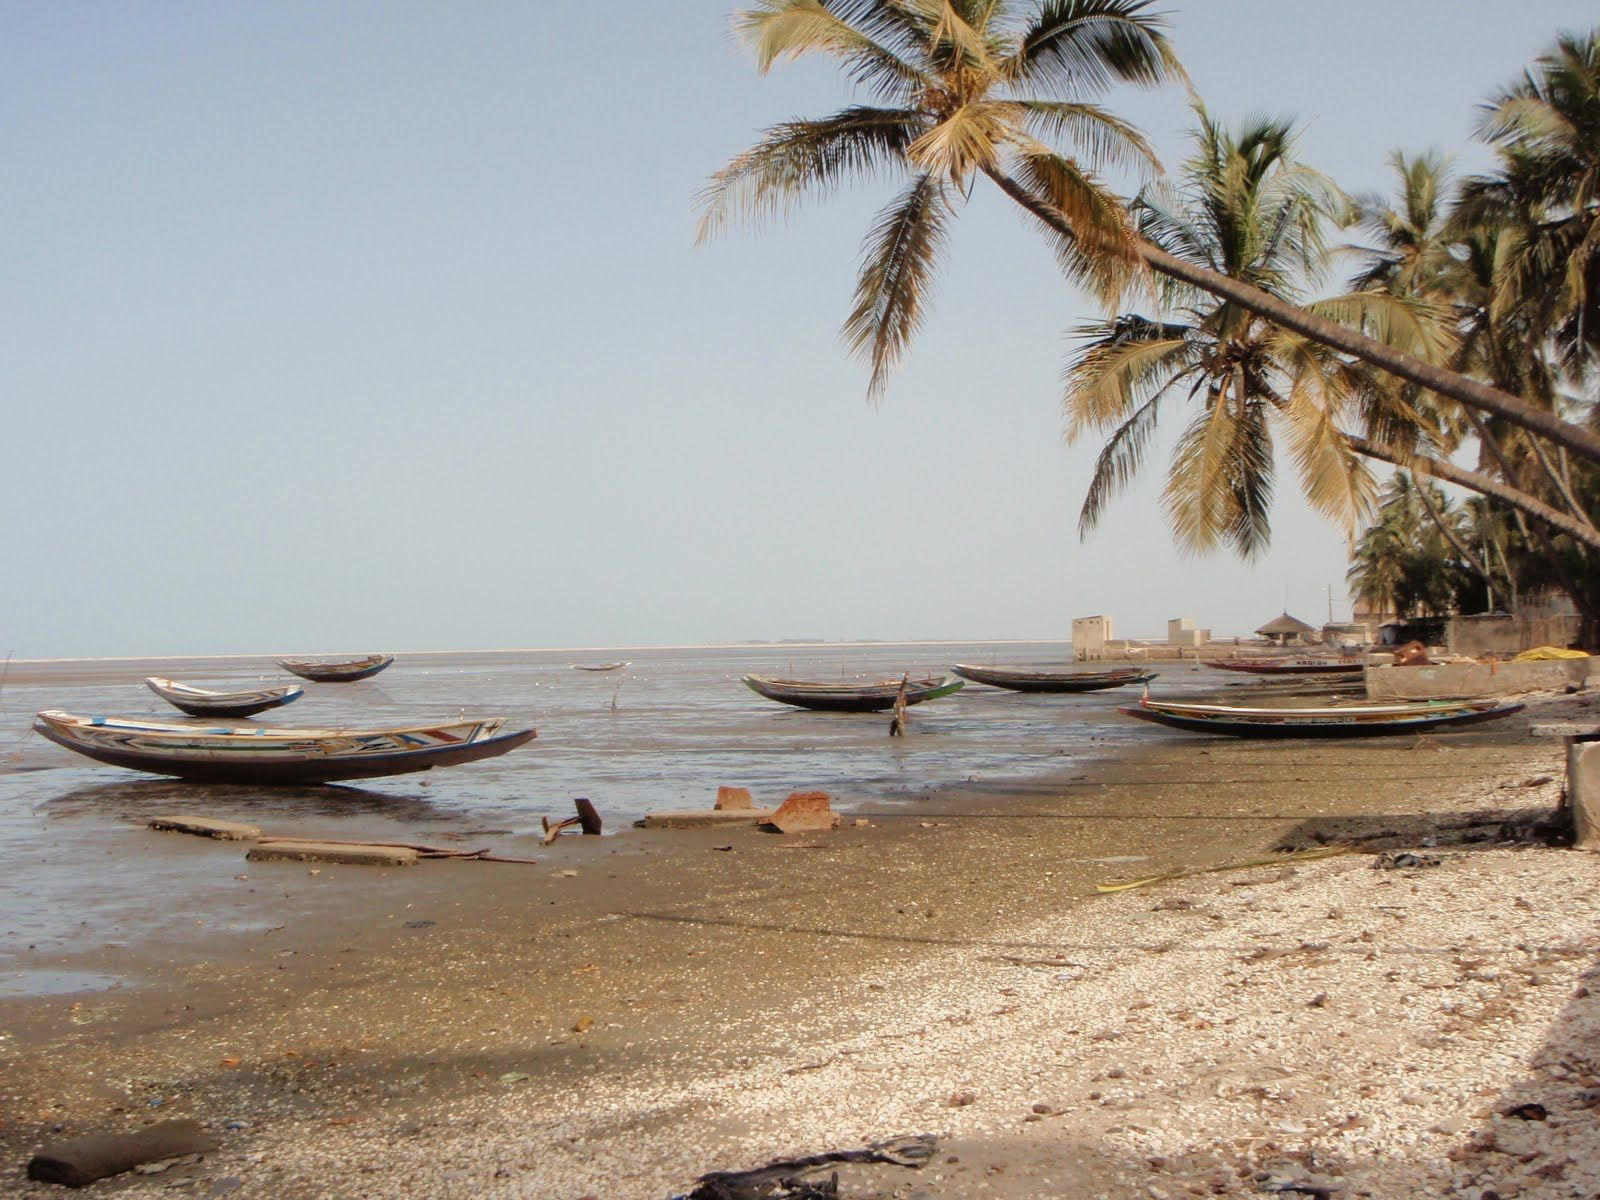 Gambia C5/G0KTO